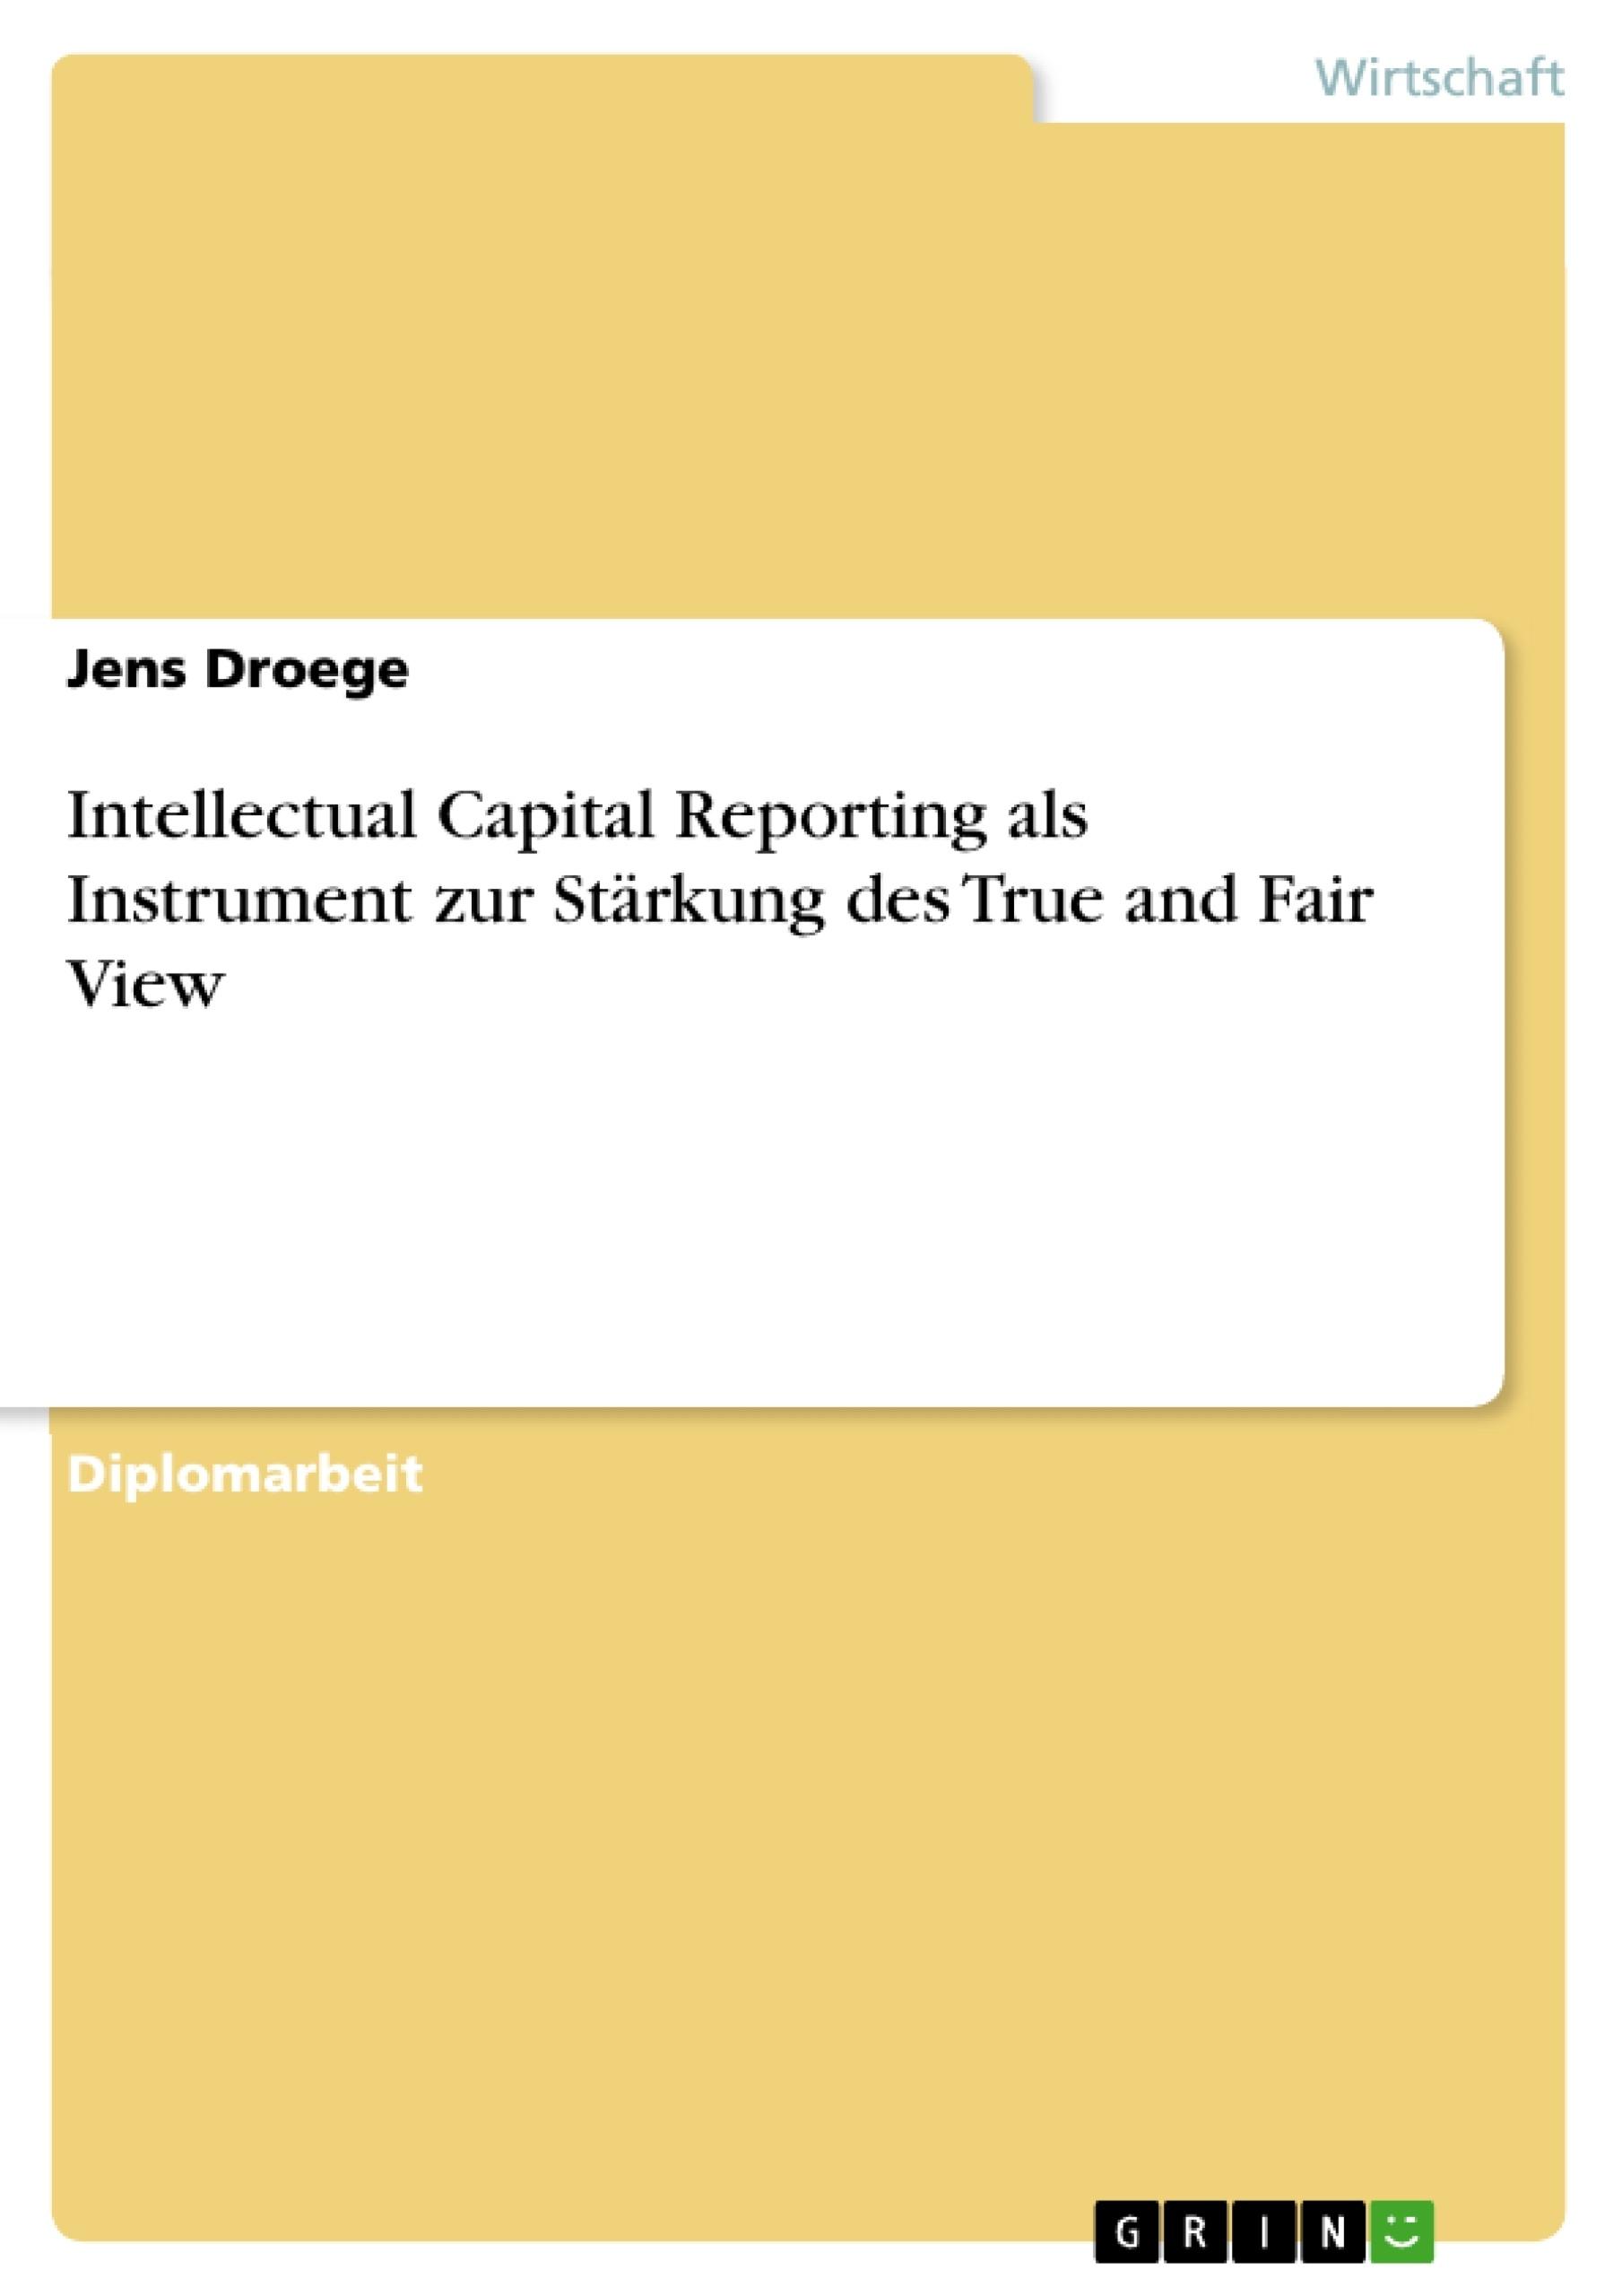 Titel: Intellectual Capital Reporting als Instrument zur Stärkung des True and Fair View